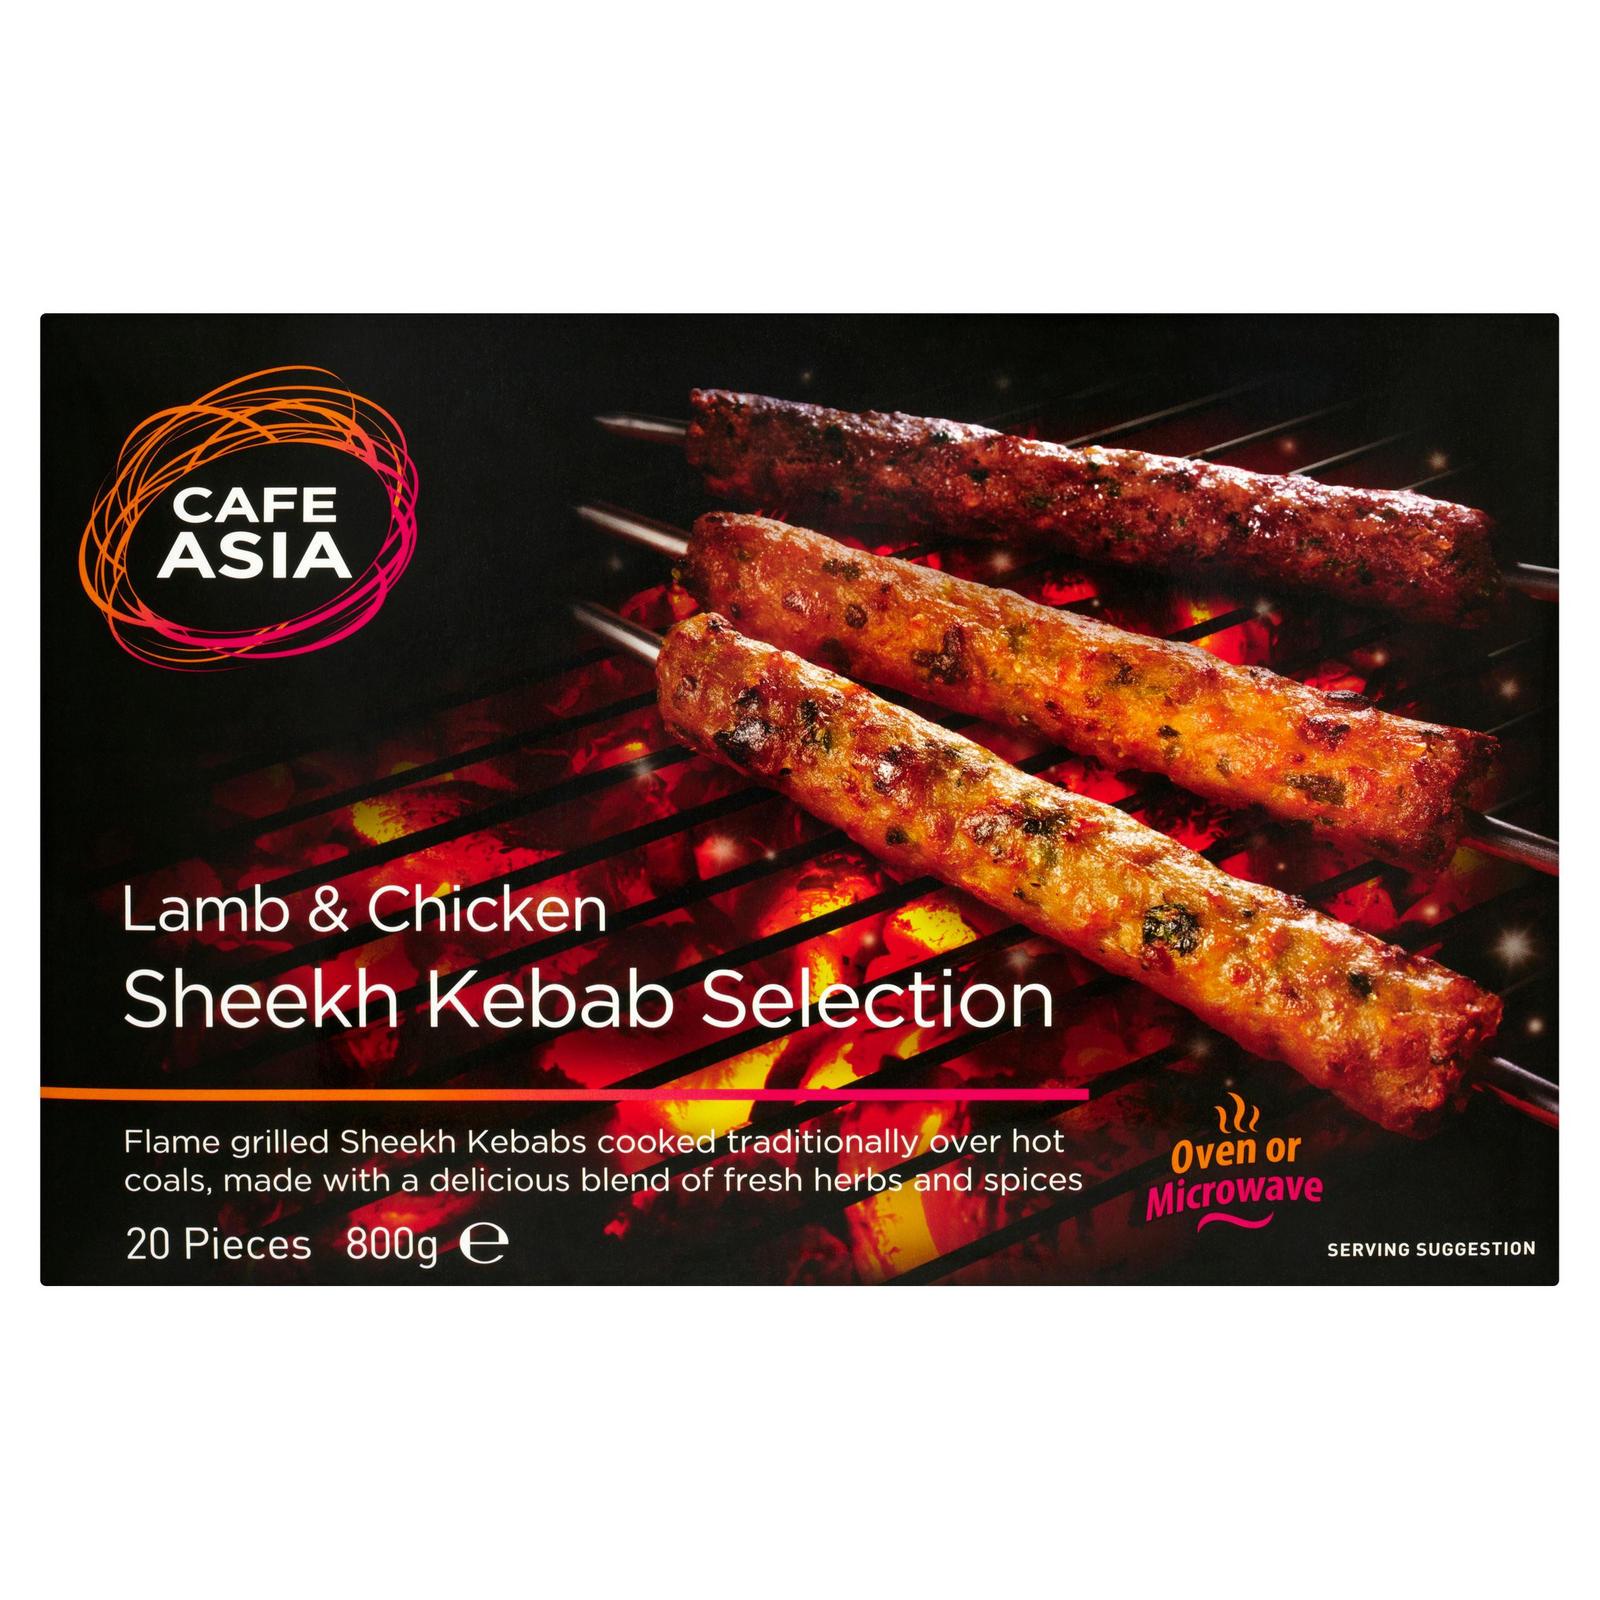 Cafe Asia 20 Lamb & Chicken Sheekh Kebab Selection 800g